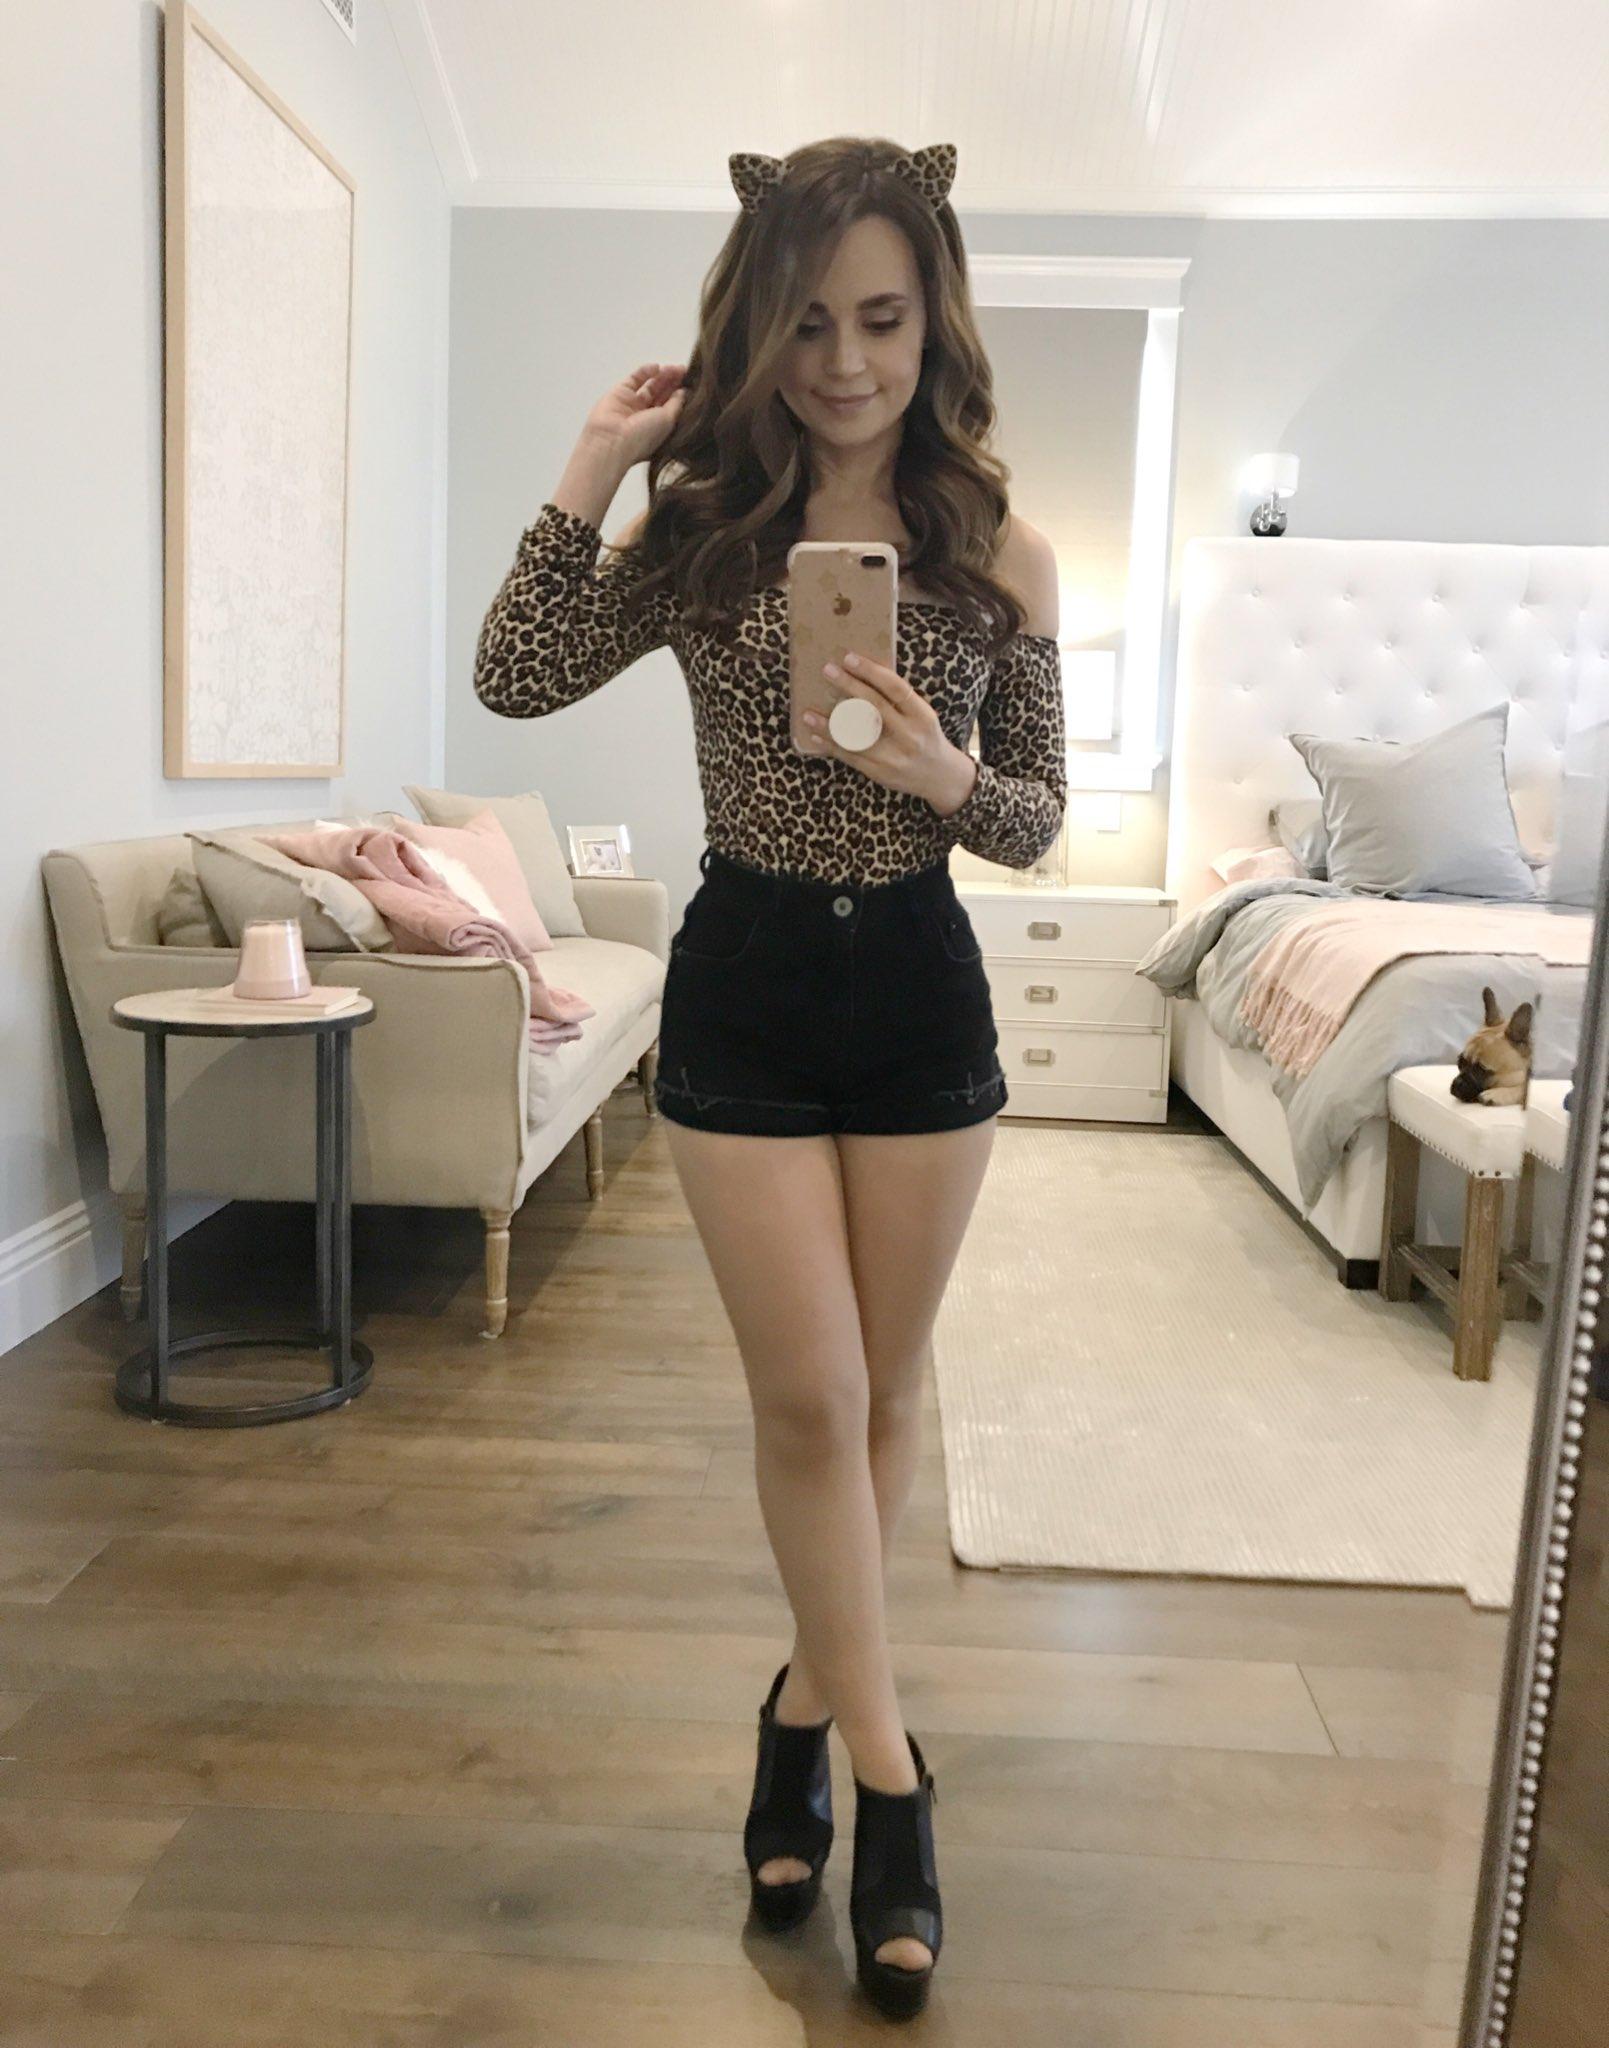 Natalia forrest chastity